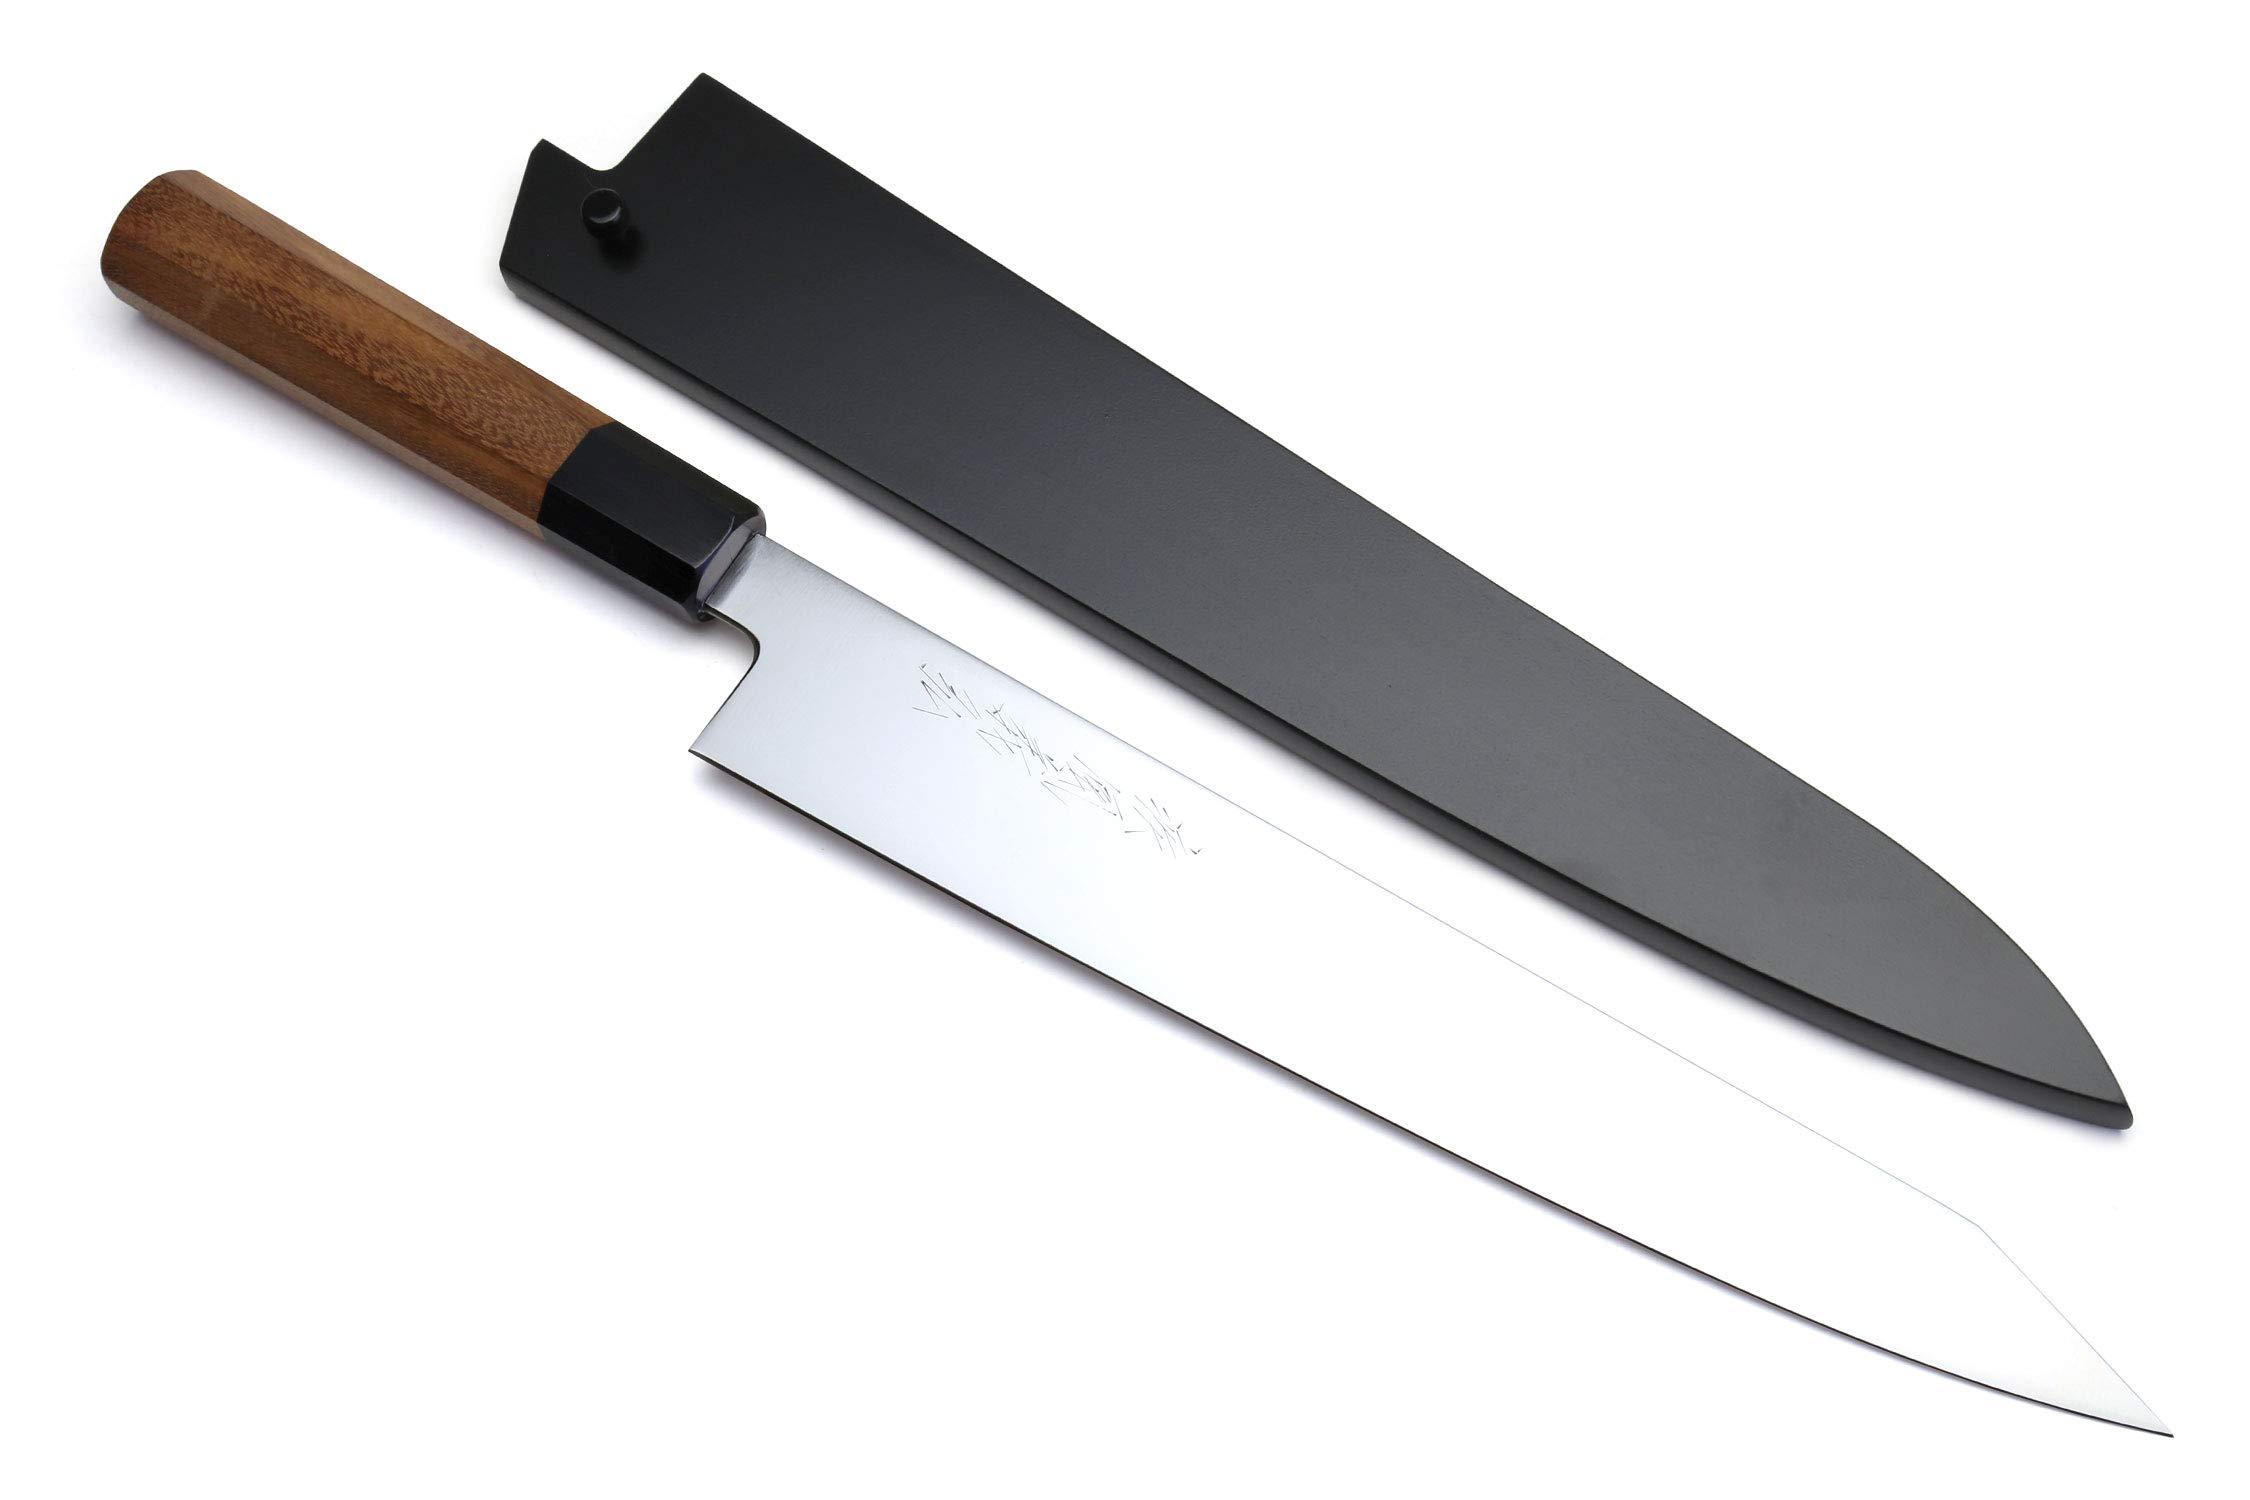 Yoshihiro VG-1 Gold Stainless Steel Sujihiki Kiritsuke Japanese Slicer Chefs Knife Ambrosia Handle w/Nuri Saya Cover (10.5'' (270mm))